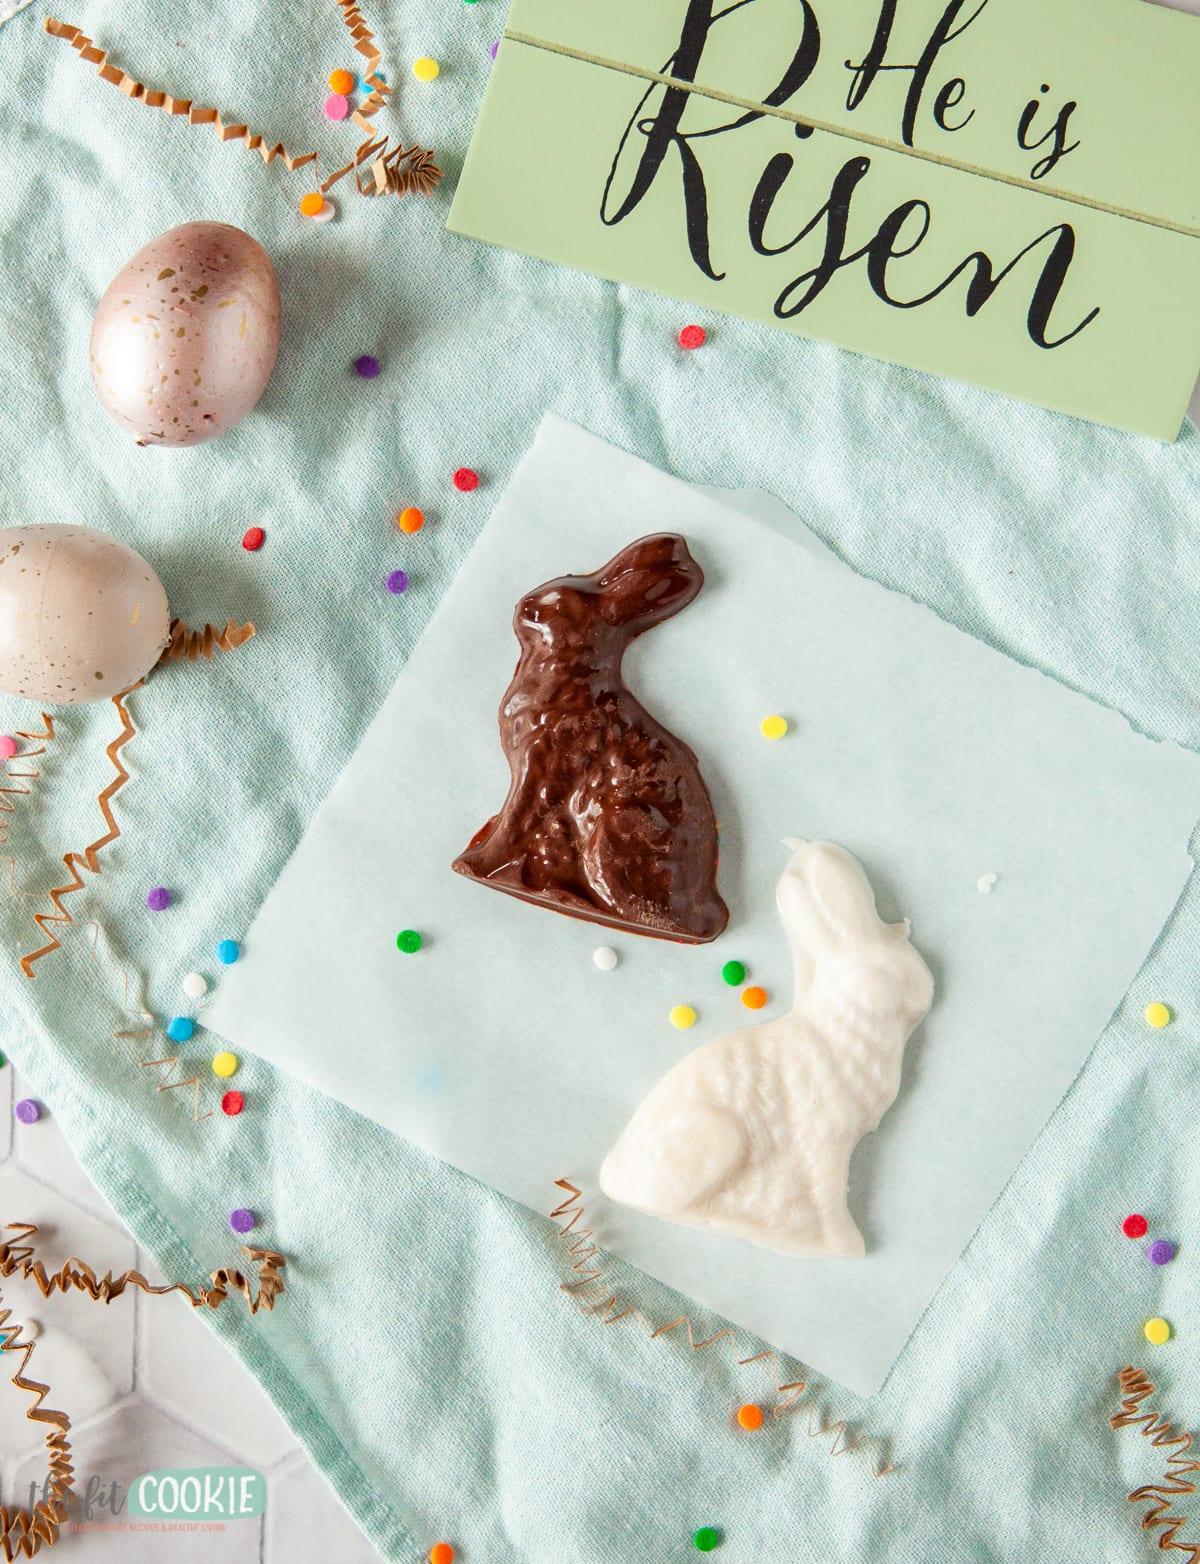 small homemade chocolate bunnies